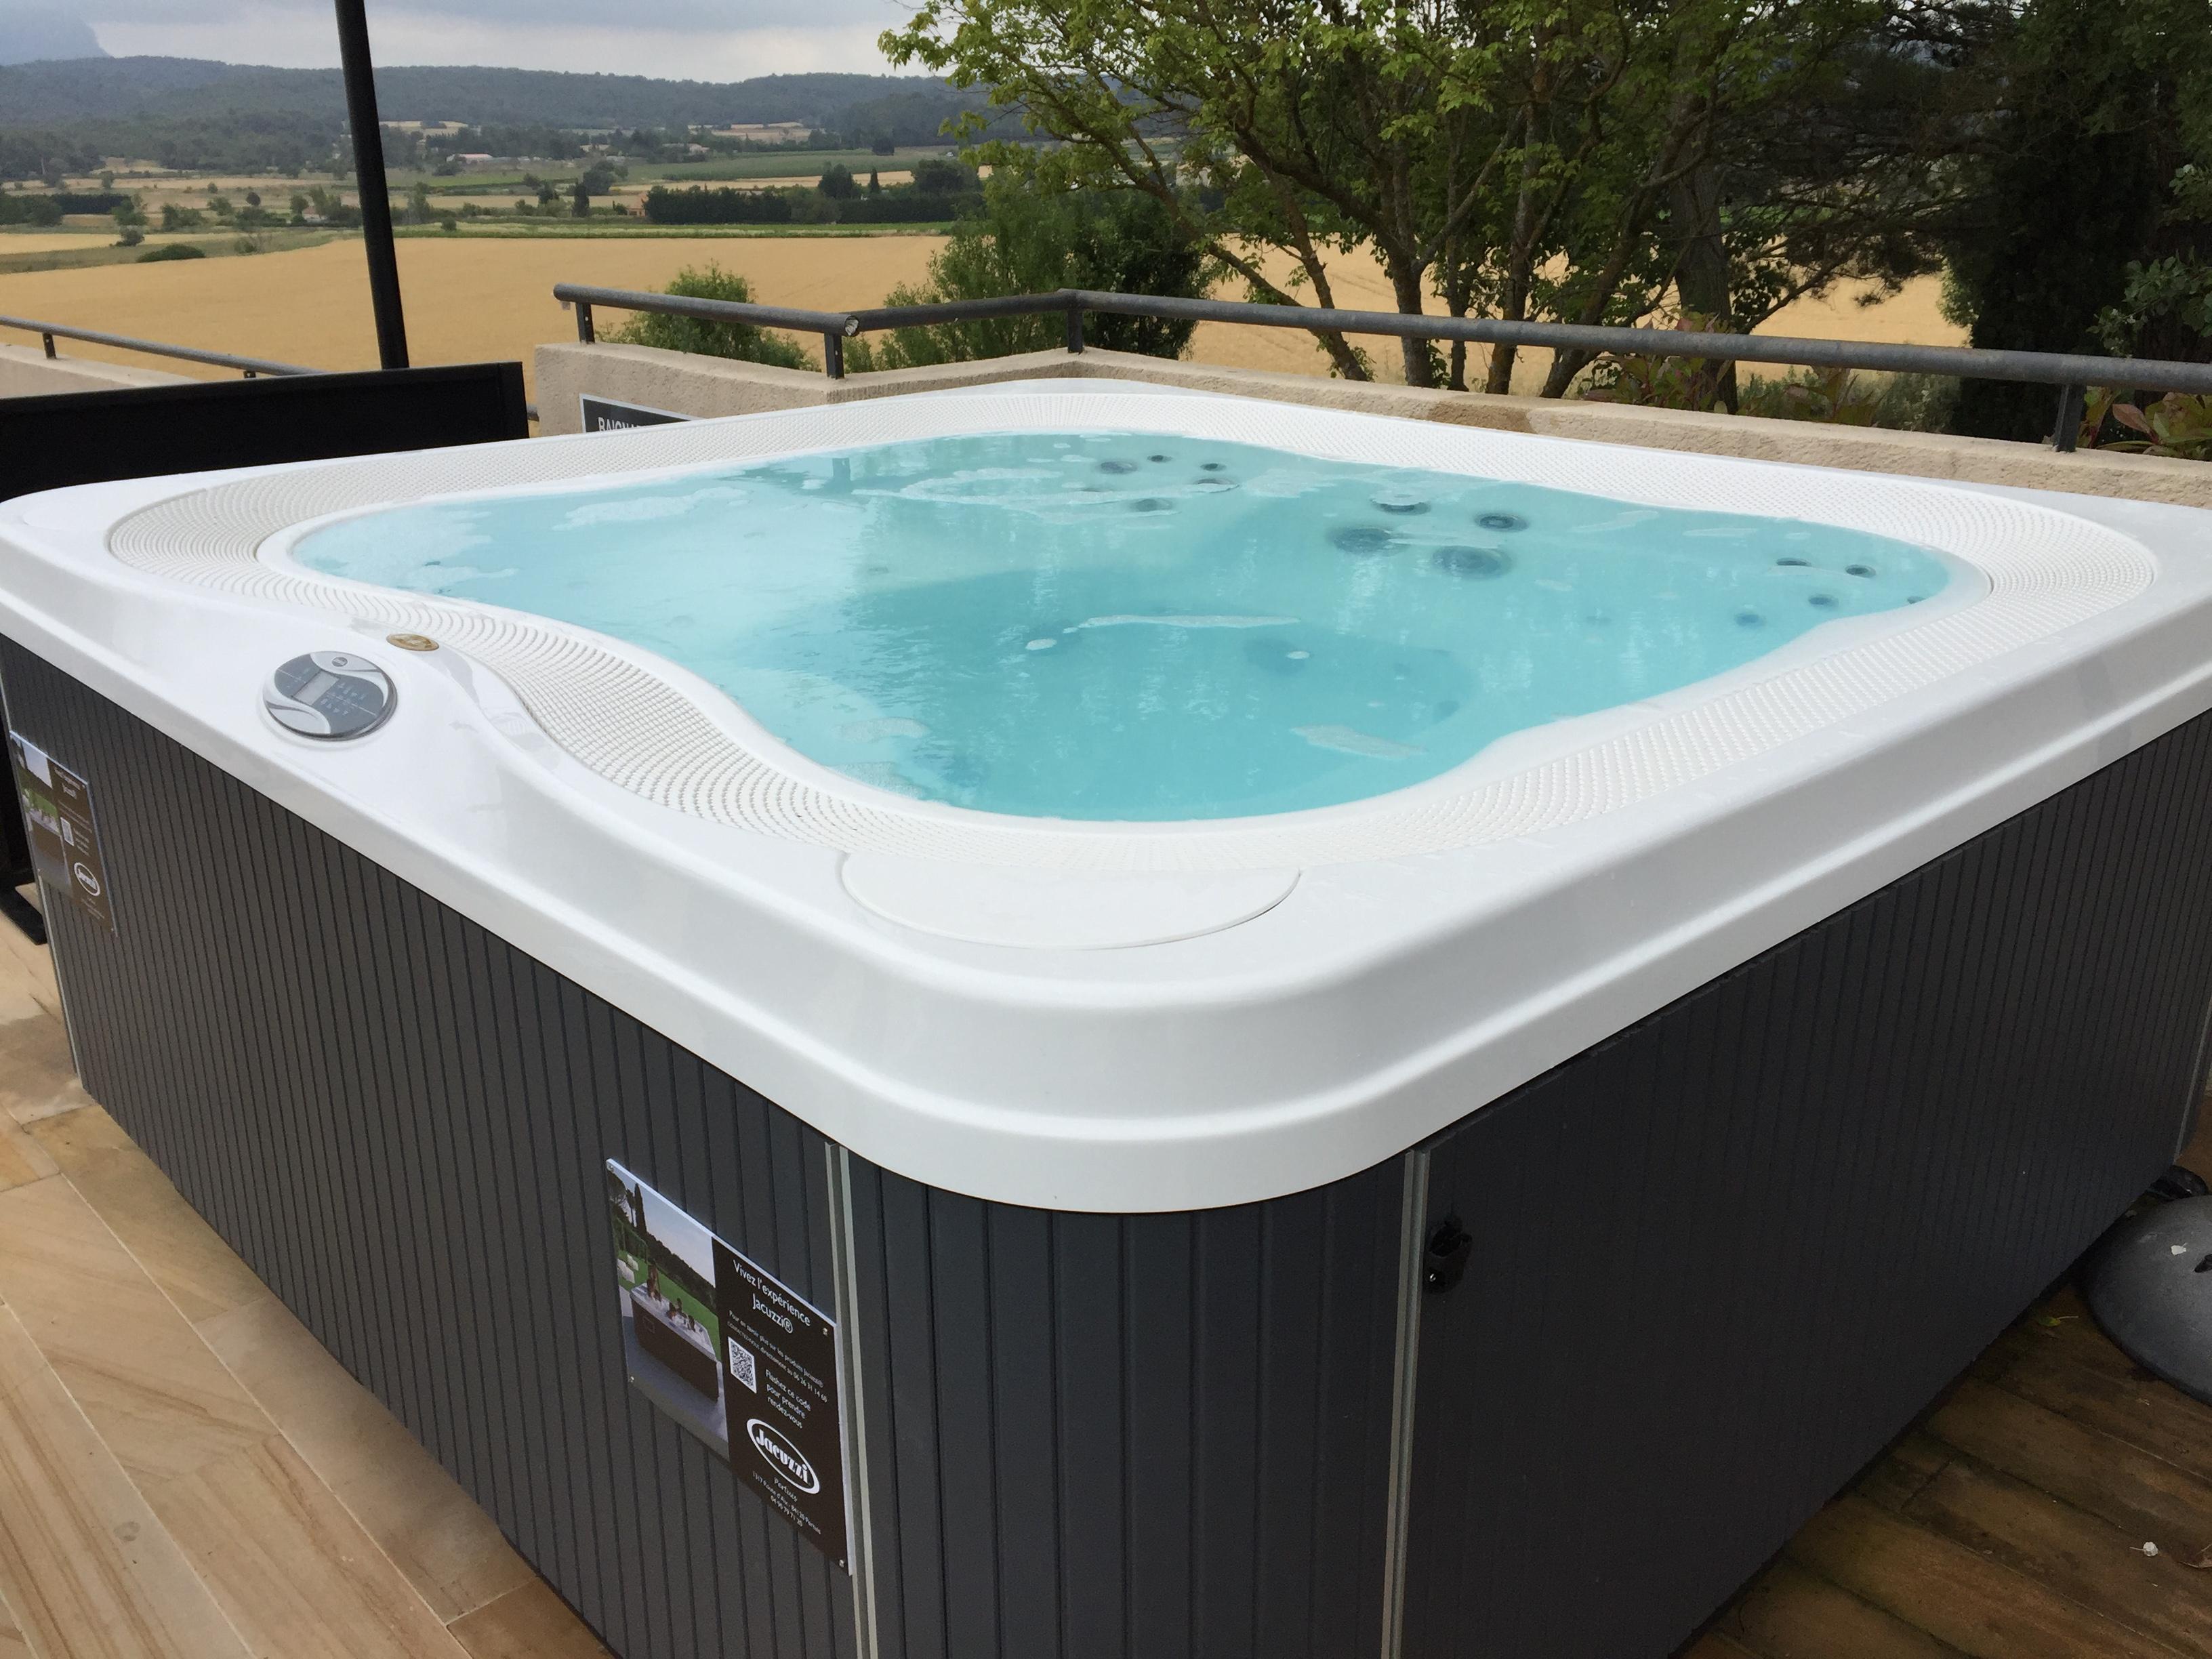 Ozeo piscine pelissanne 20171008113927 for Piscine jacuzzi